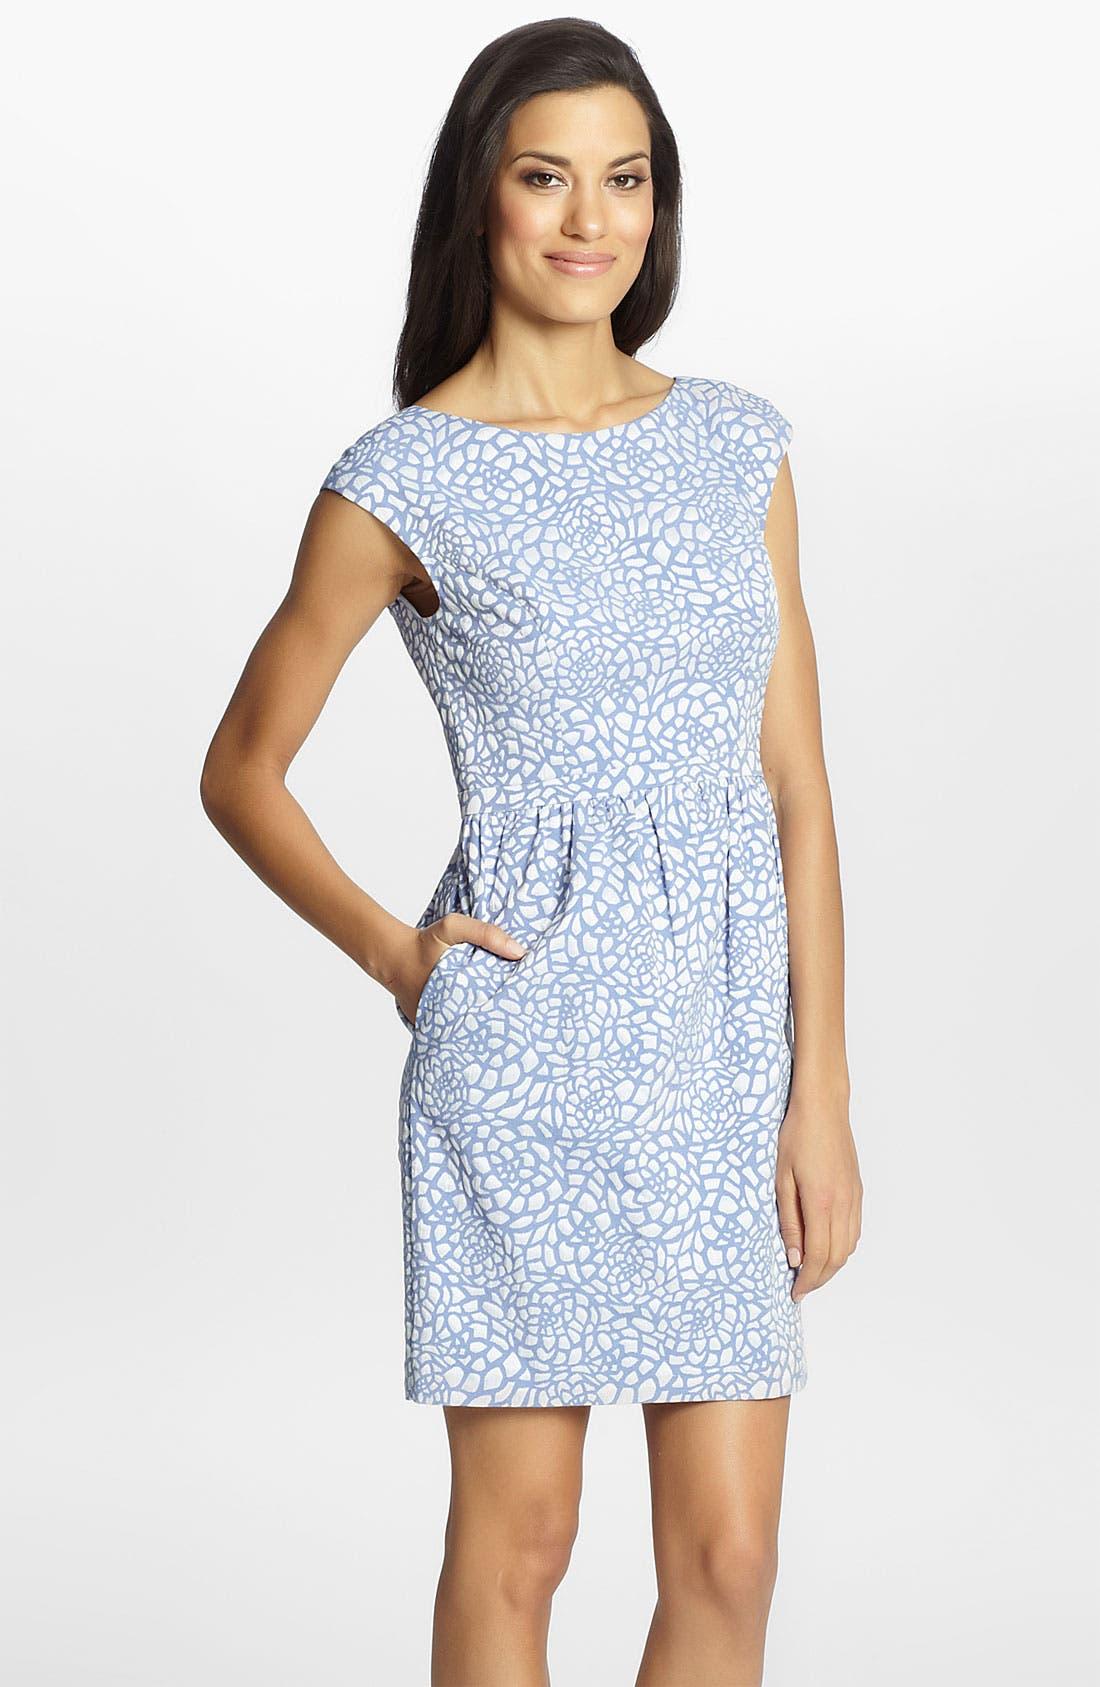 Main Image - Cynthia Steffe 'Jasmine' Print Jacquard Dress